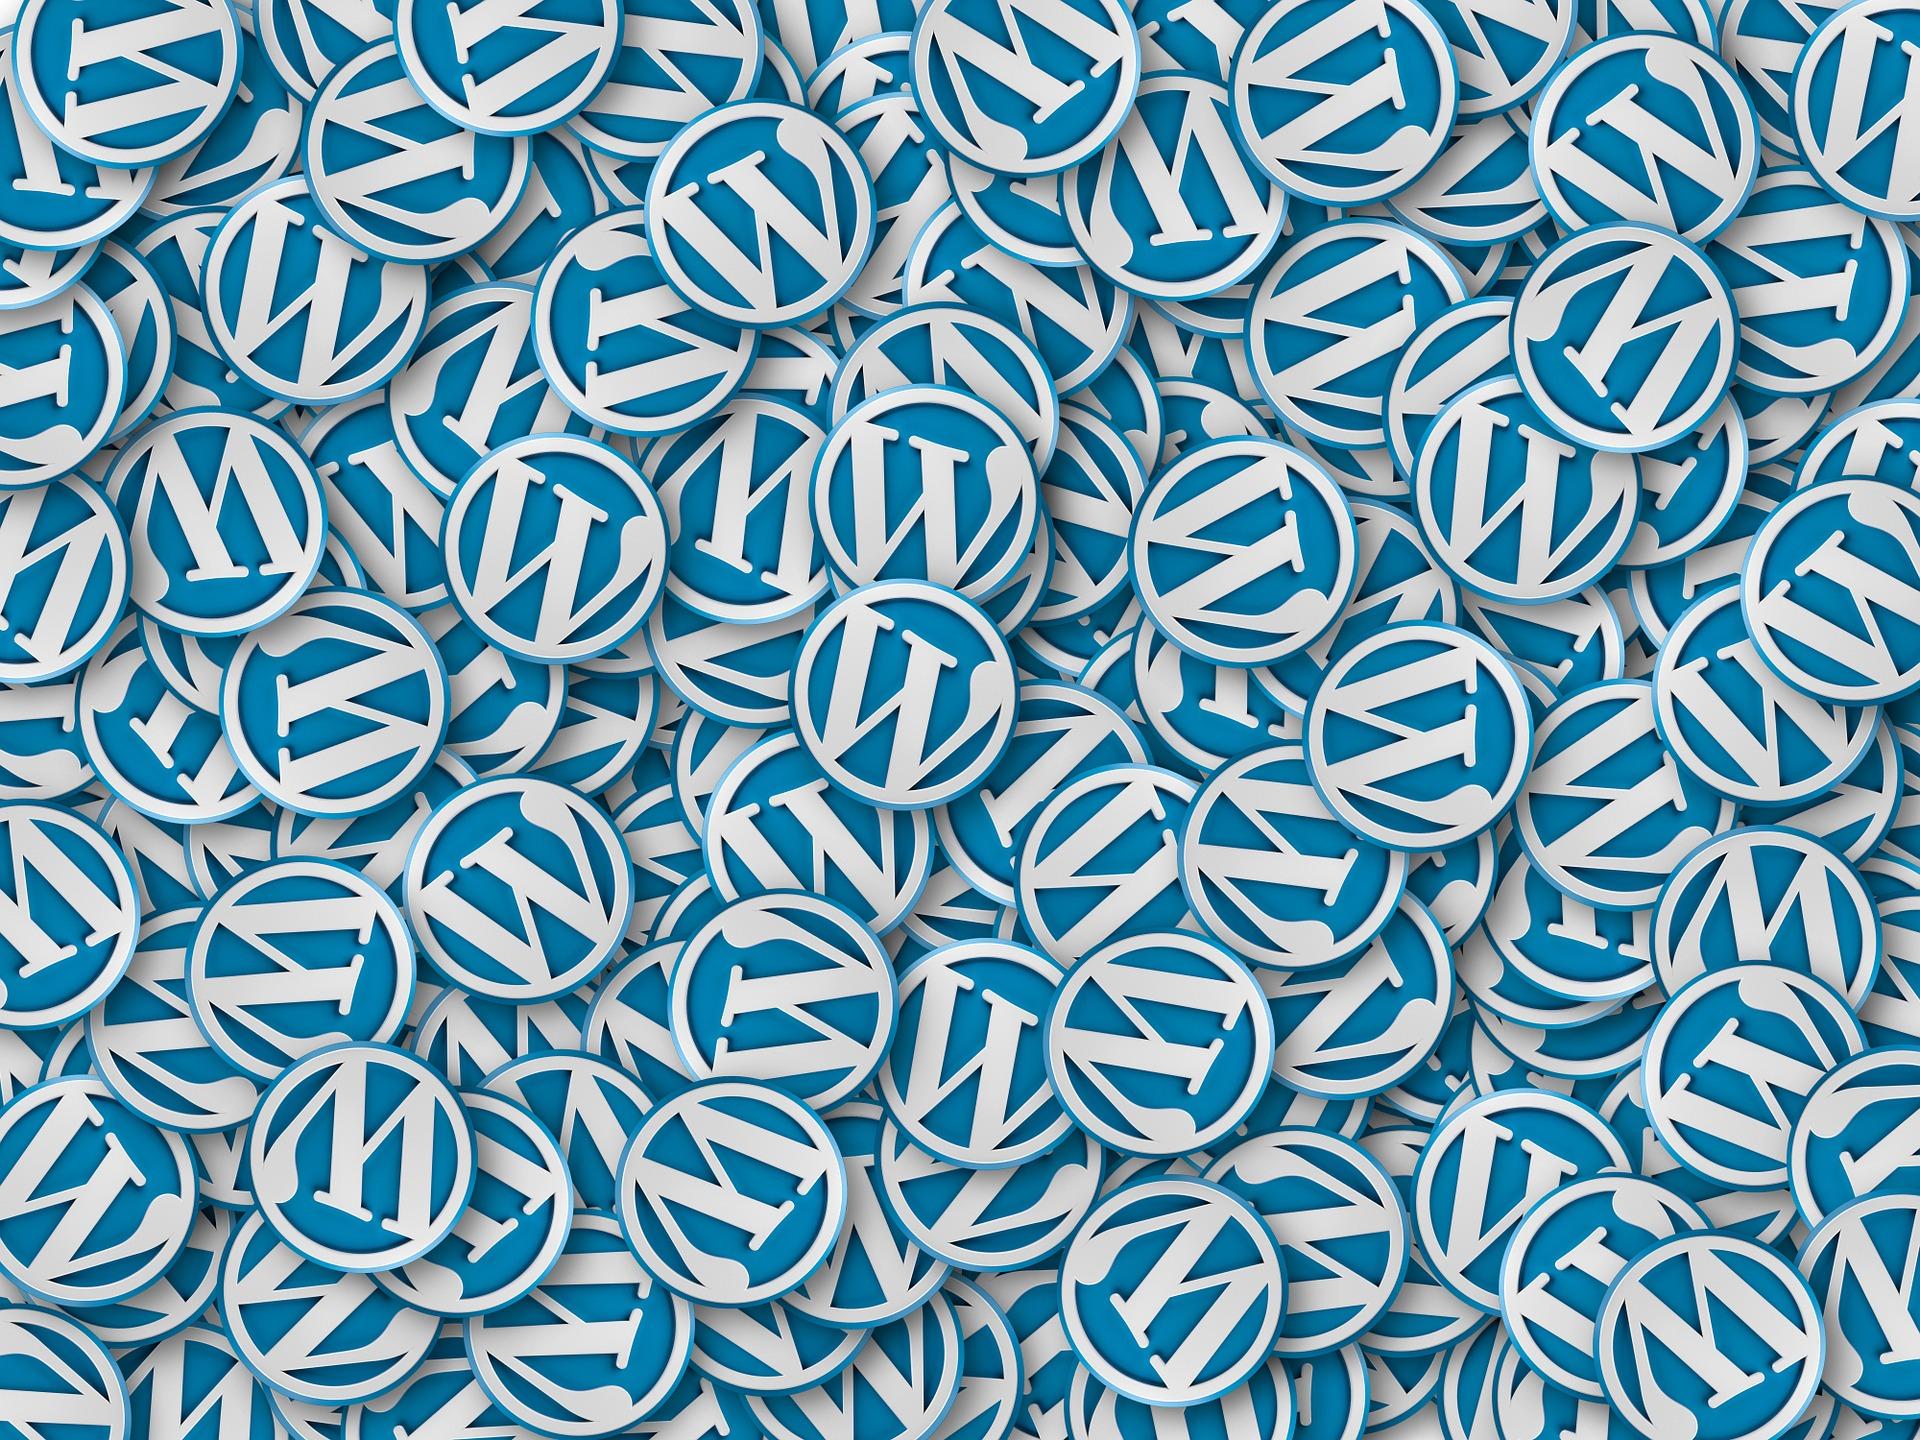 wordpress wallpaper badges